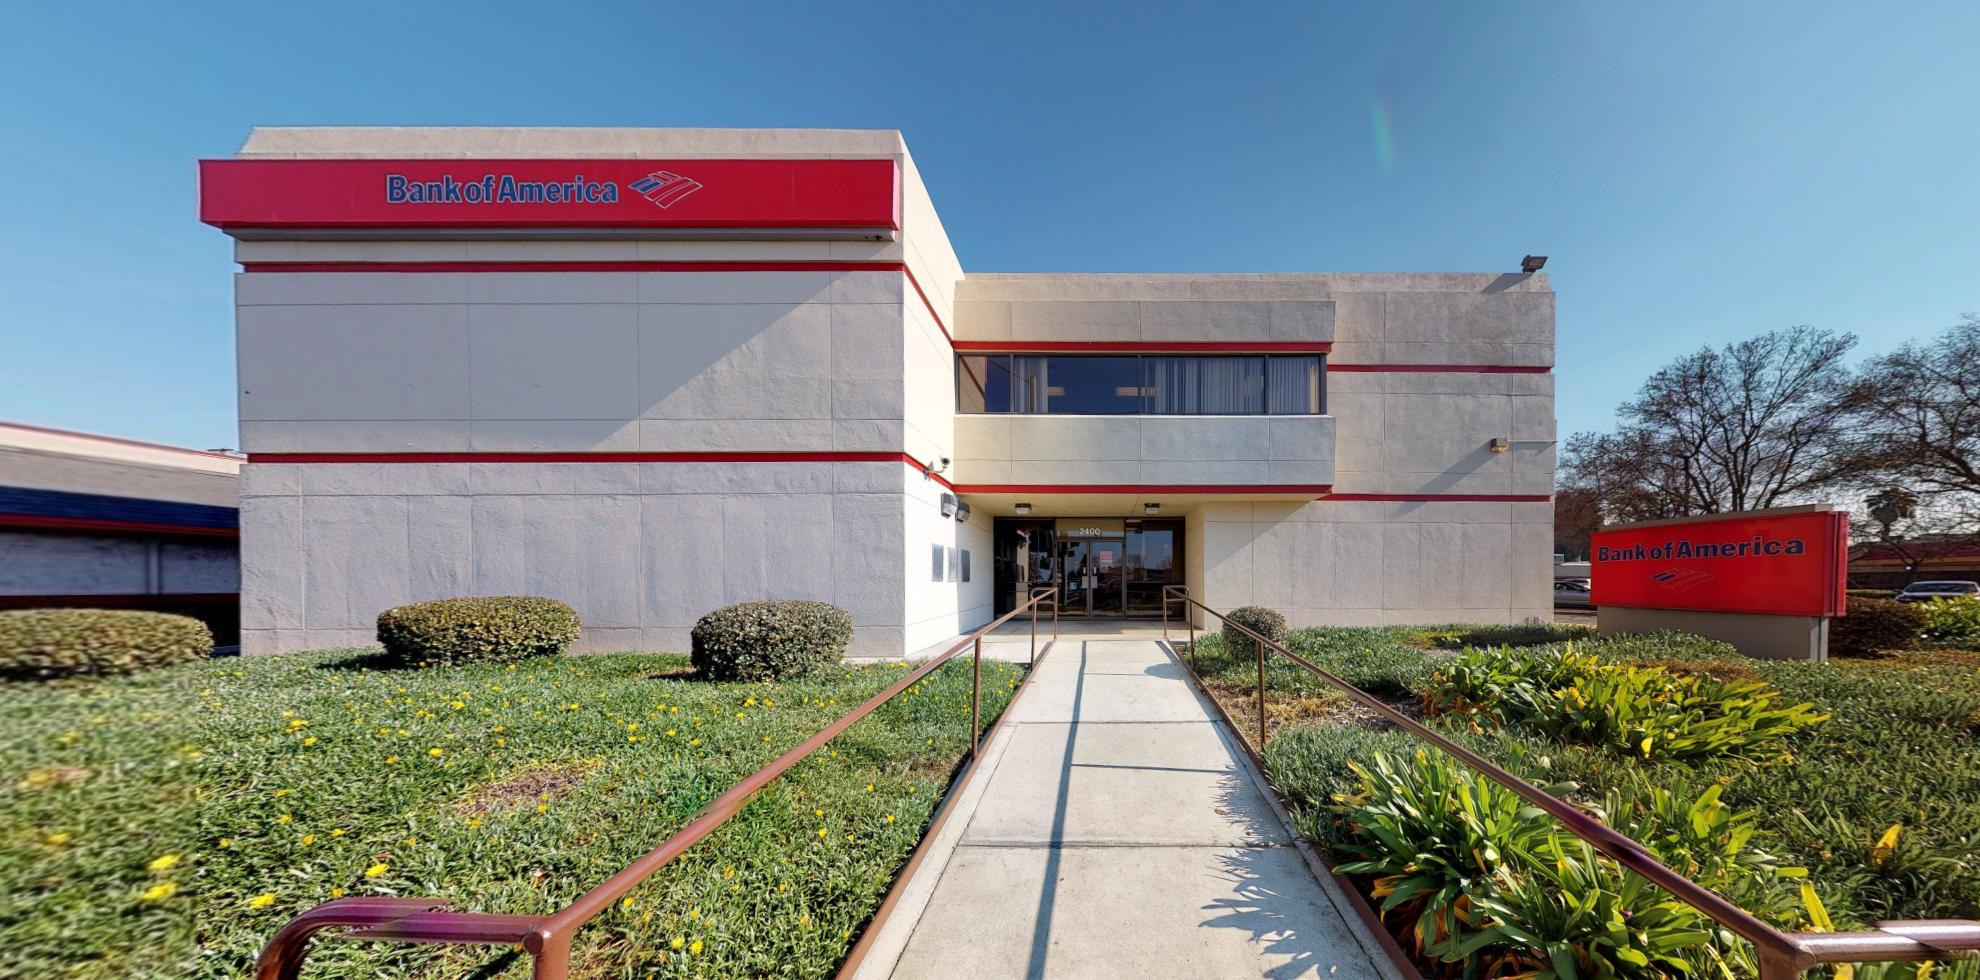 Bank of America financial center with drive-thru ATM   2400 S Mooney Blvd, Visalia, CA 93277